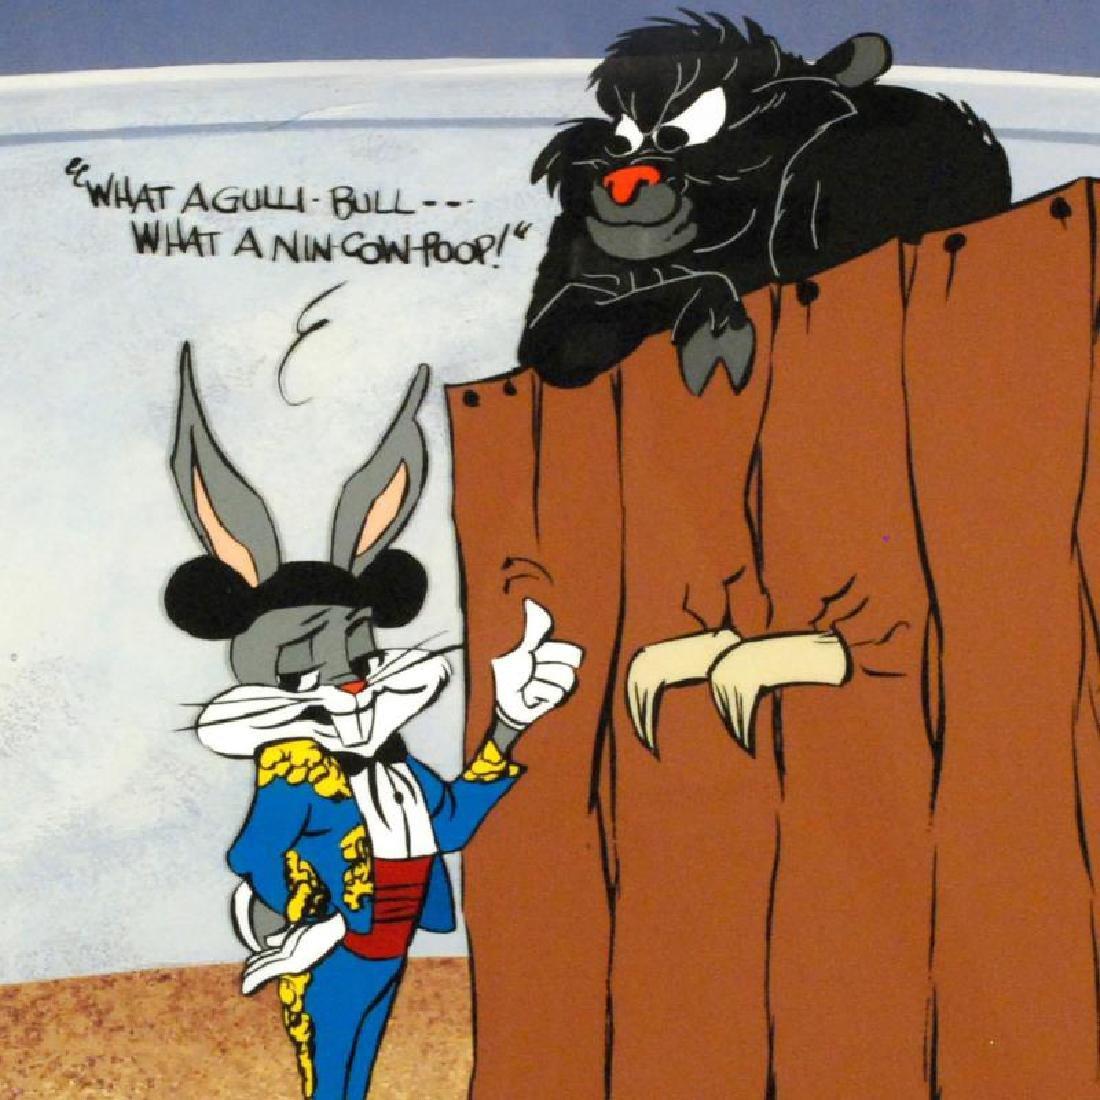 Bugs and Gulli-bull - 2